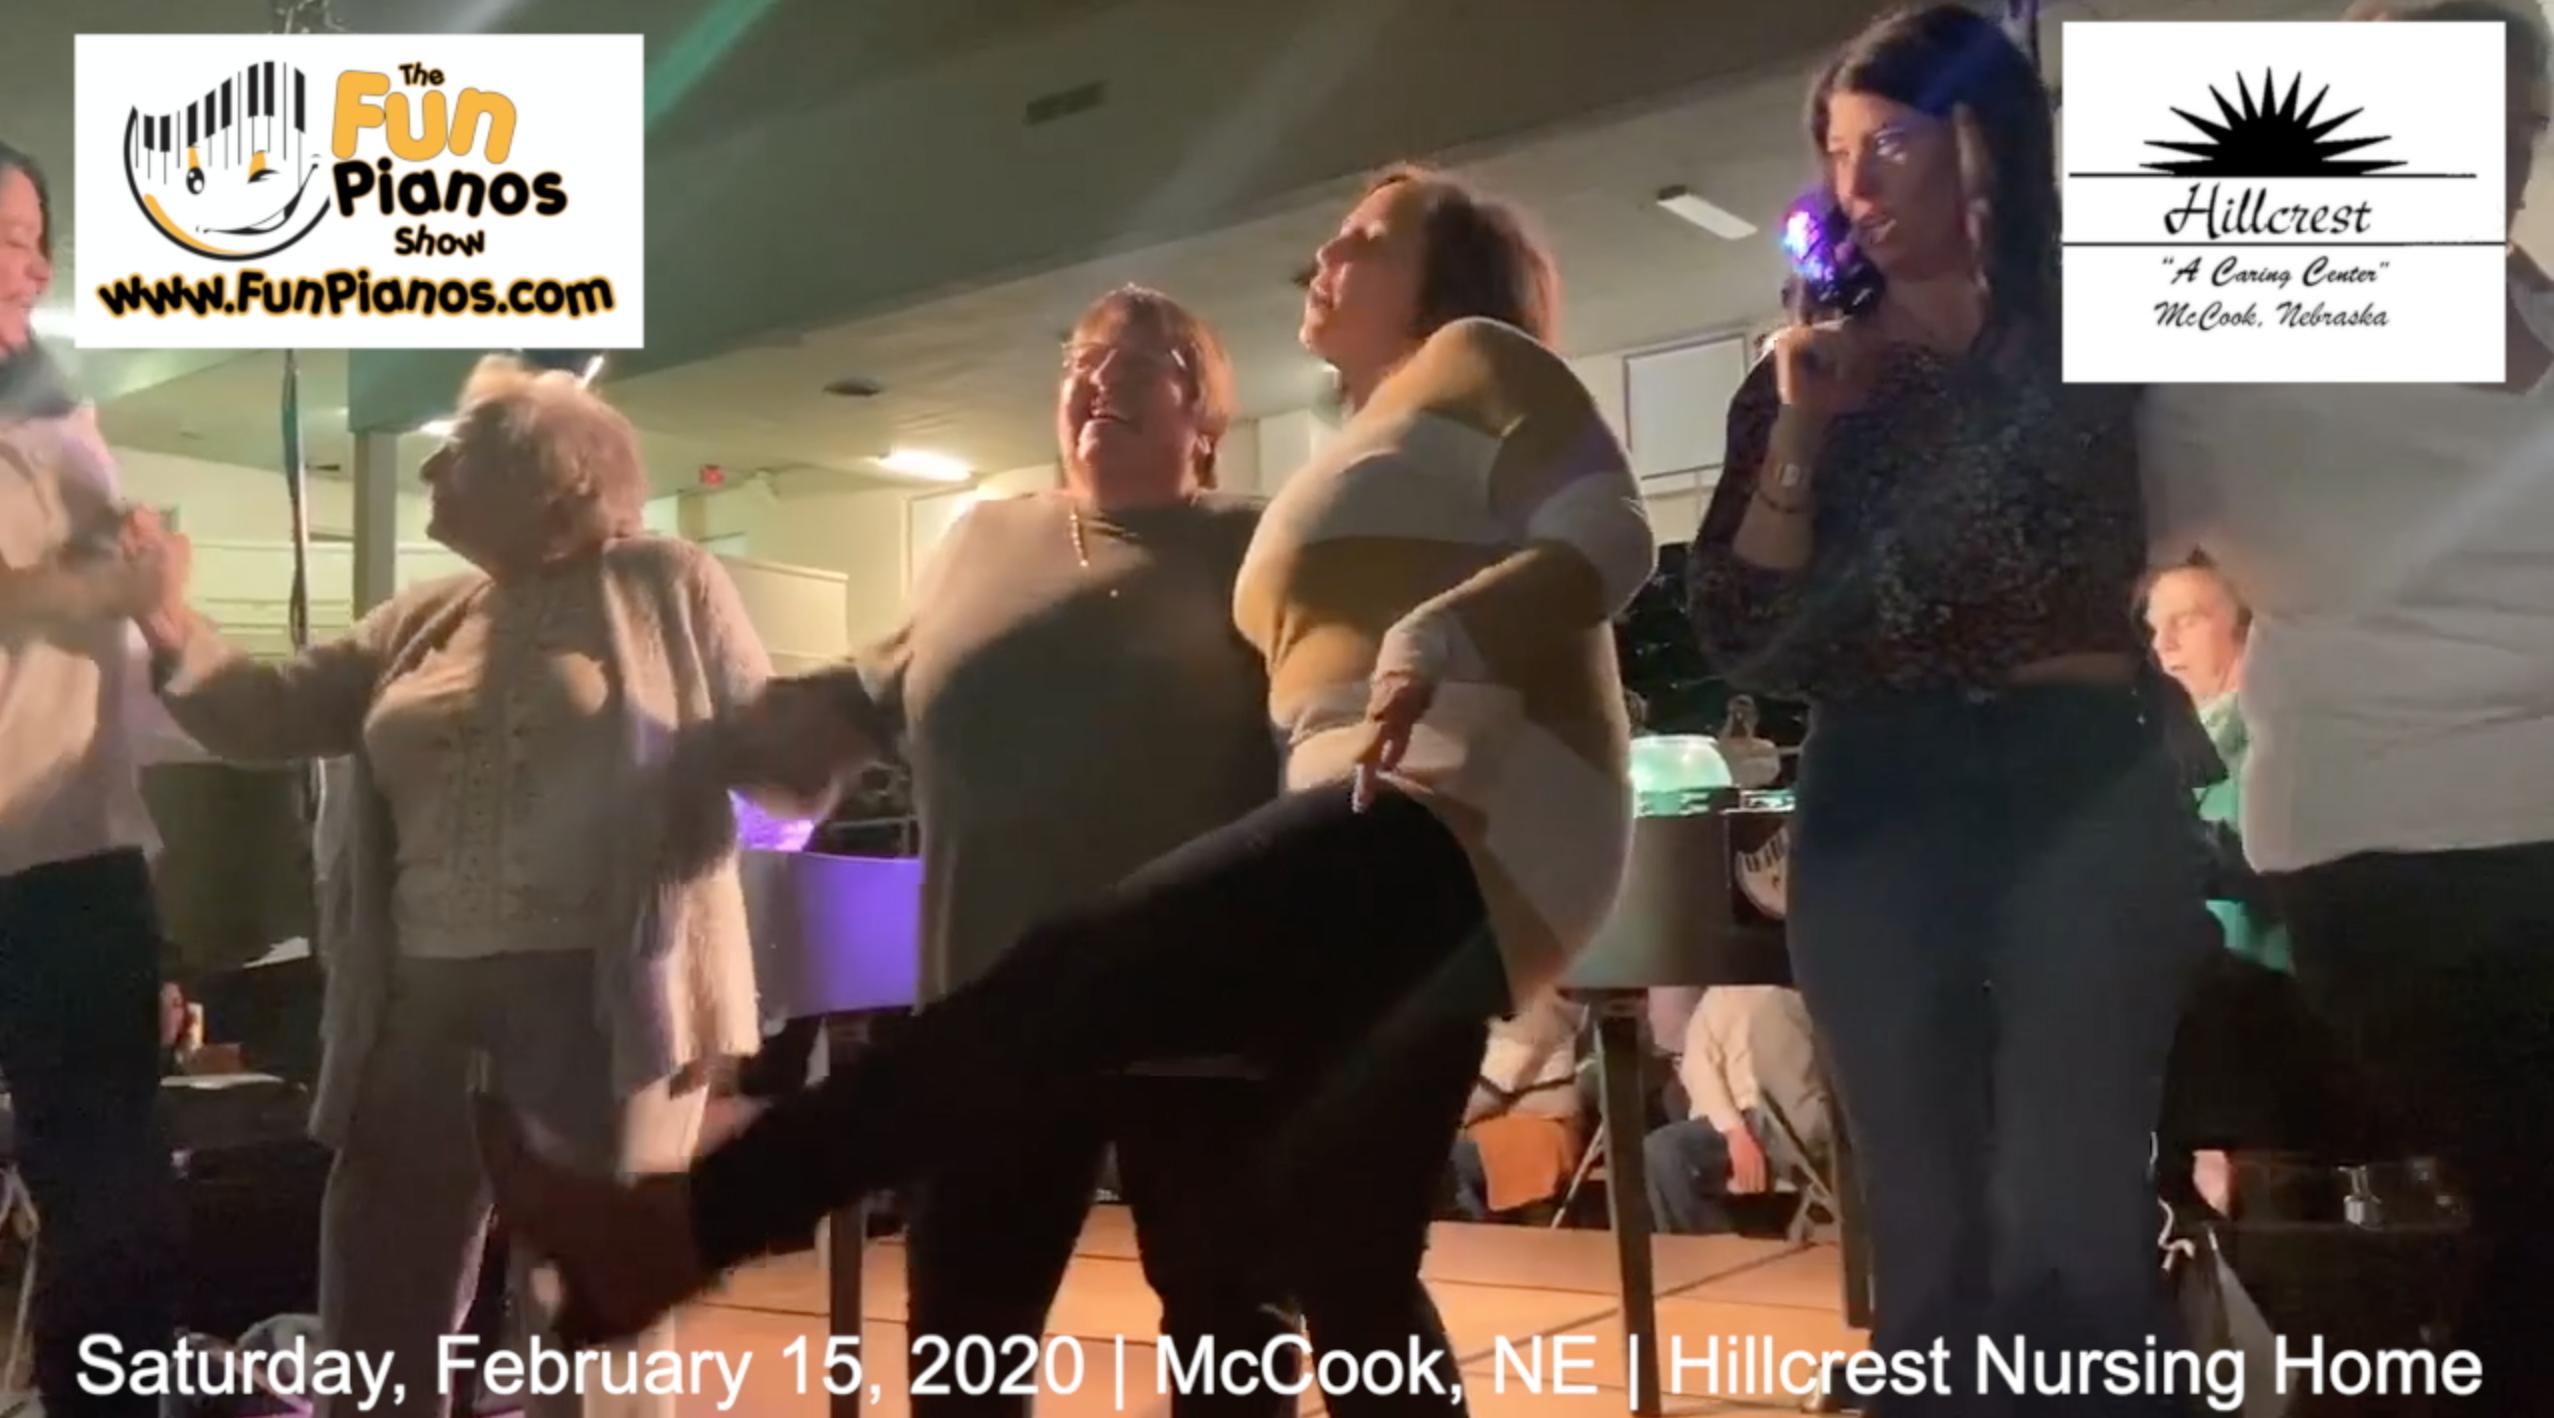 Fun Pianos! Dueling Pianos show in McCook, NE 2/15/20